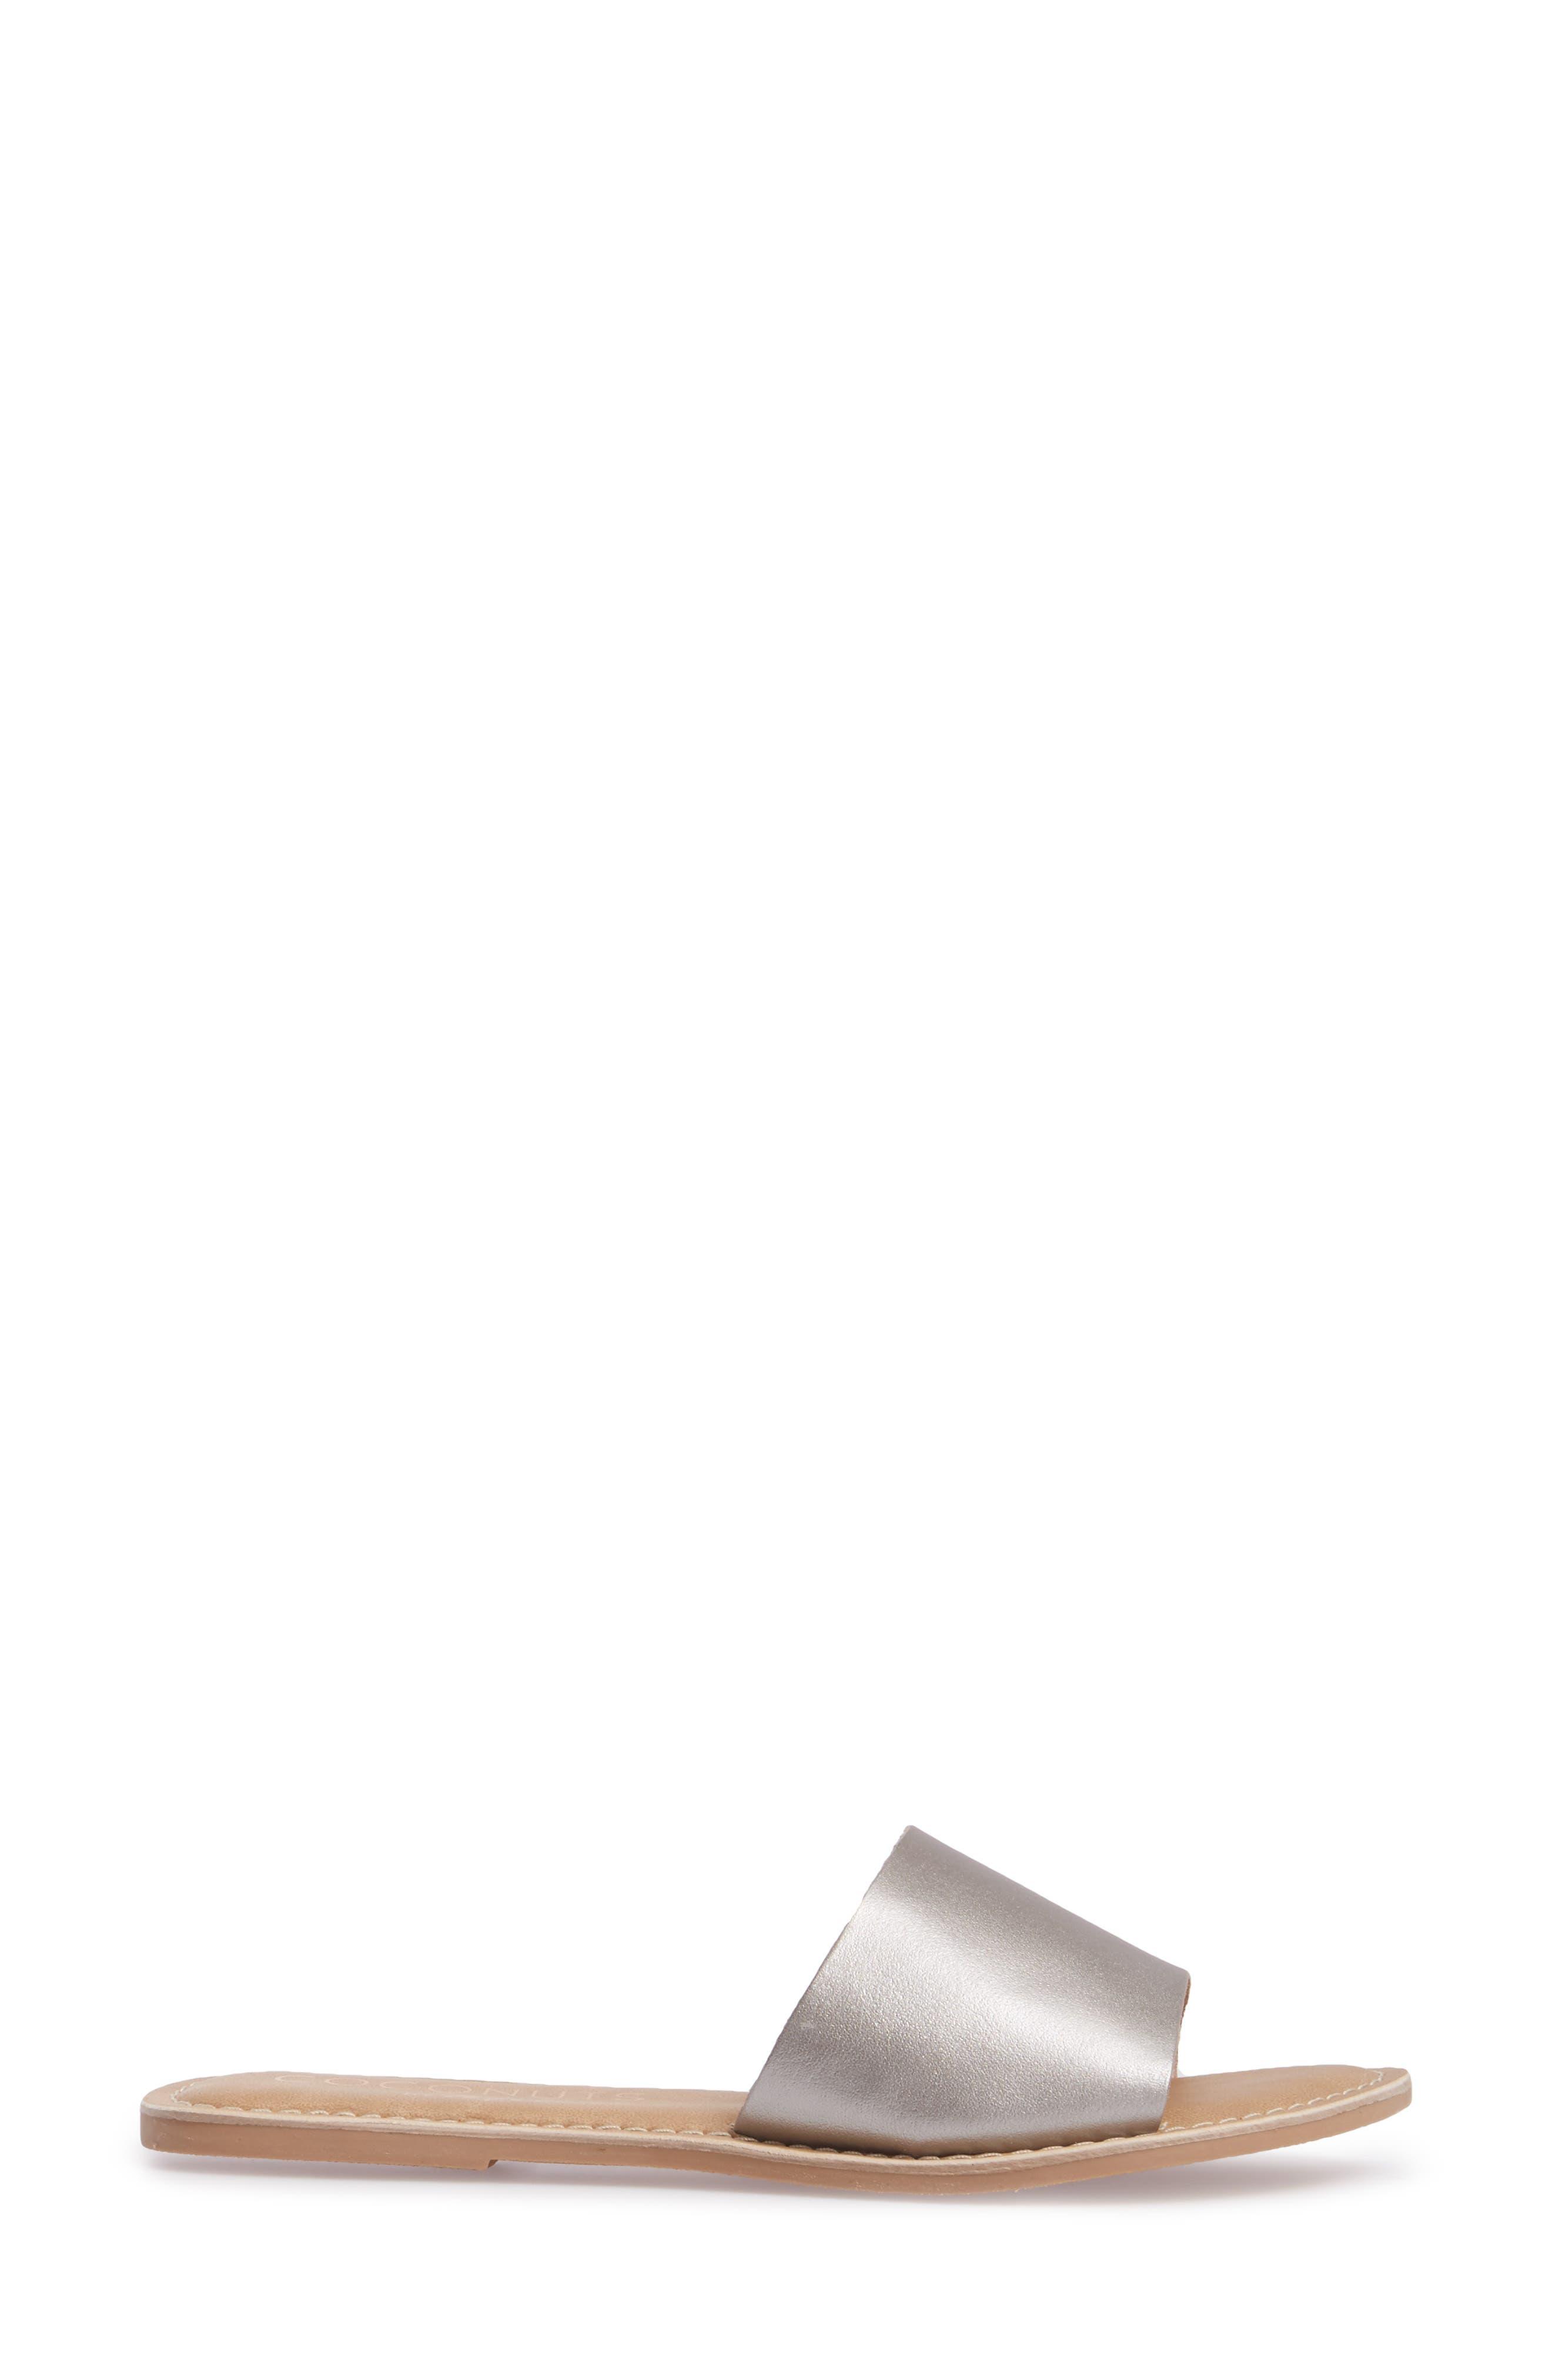 Cabana Slide Sandal,                             Alternate thumbnail 3, color,                             Ice Leather